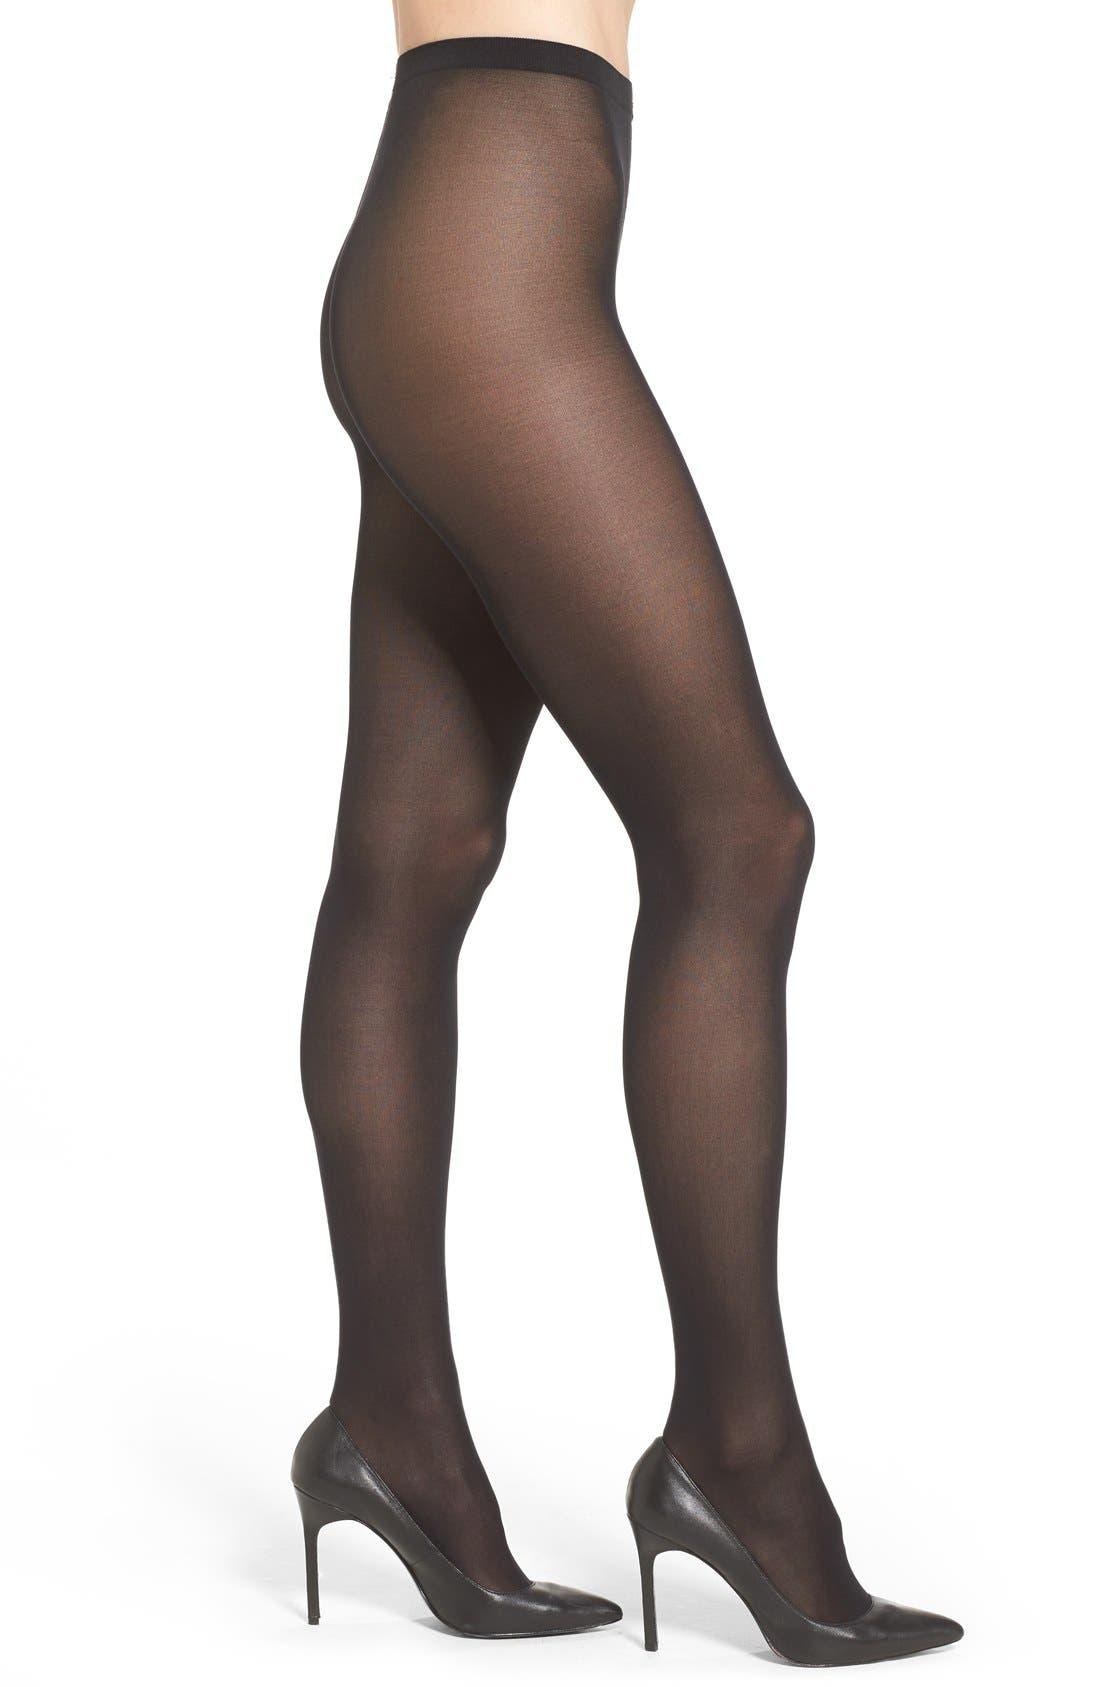 Main Image - Wolford 'Velvet de Luxe' Semi-Opaque Tights